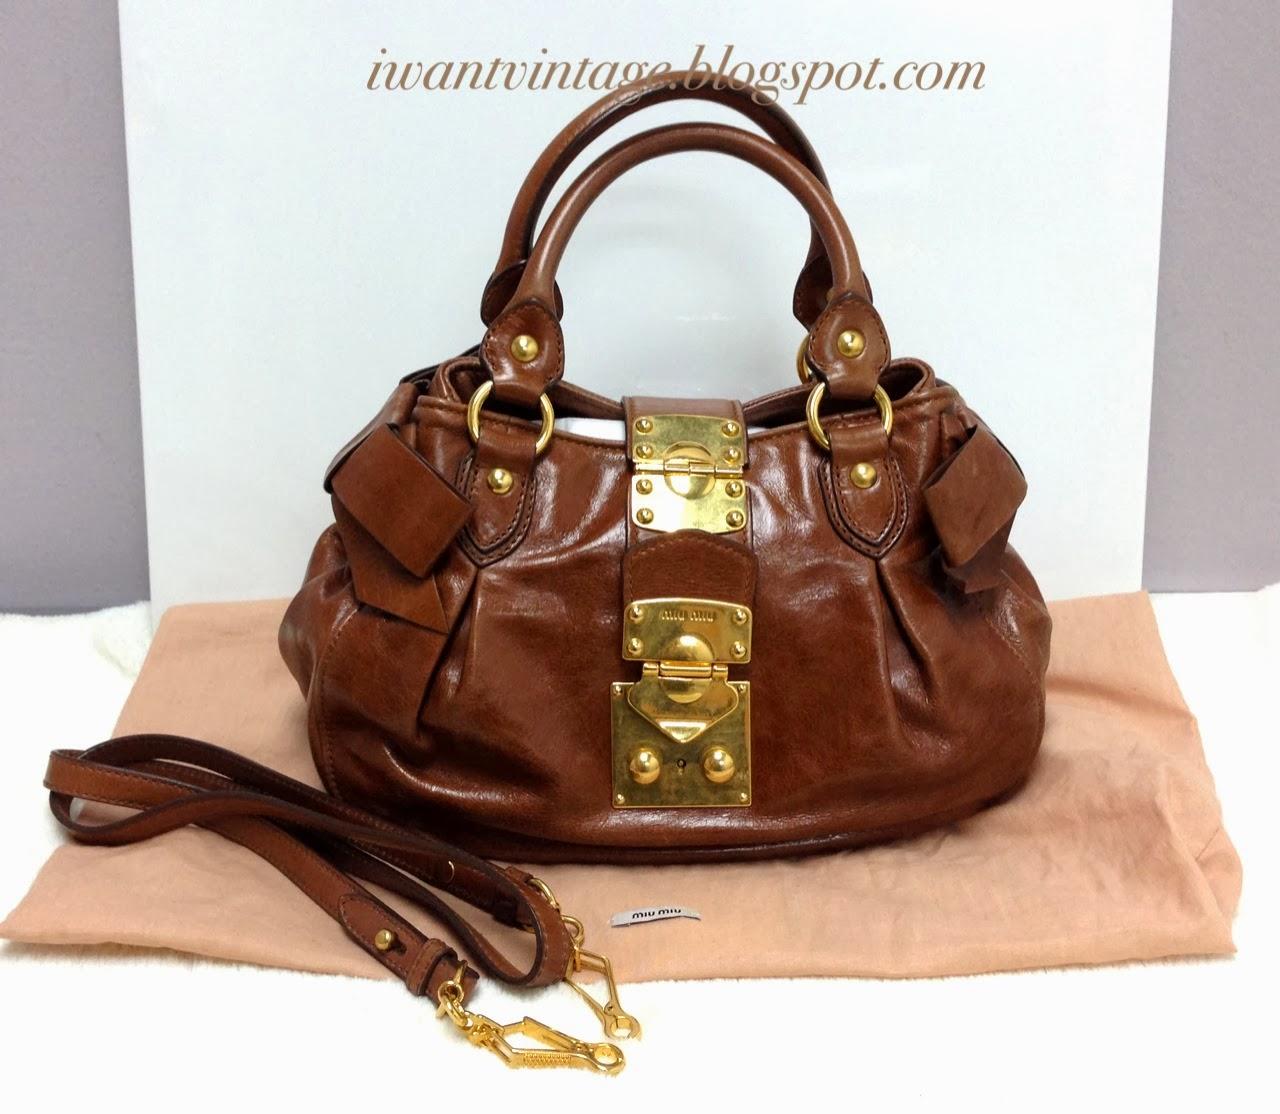 Miu vitello lux small bow bag with clasp lock closure brown jpg 1280x1114 Miu  vitello bags 30dc0391d1